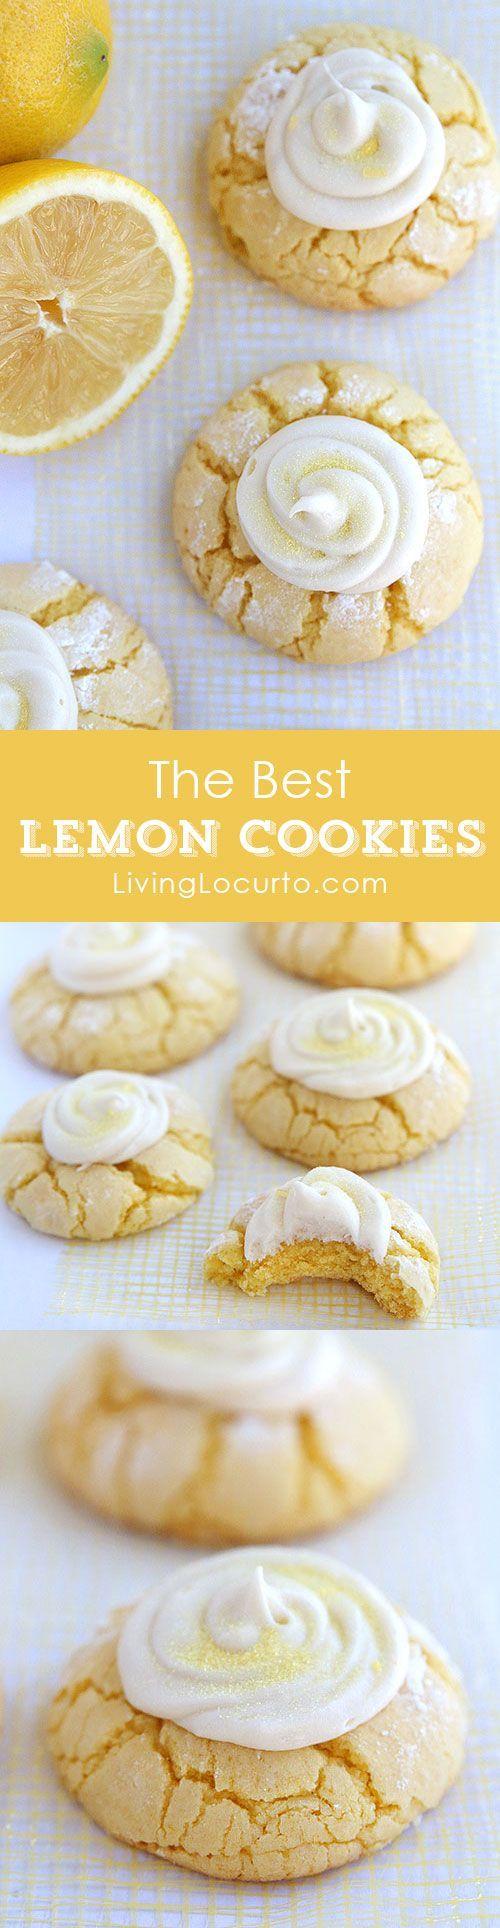 Lemon Crinkle Cookies Recipe with Lemon Frosting. The best lemon cookies you'll make!! Livinglocurto.com